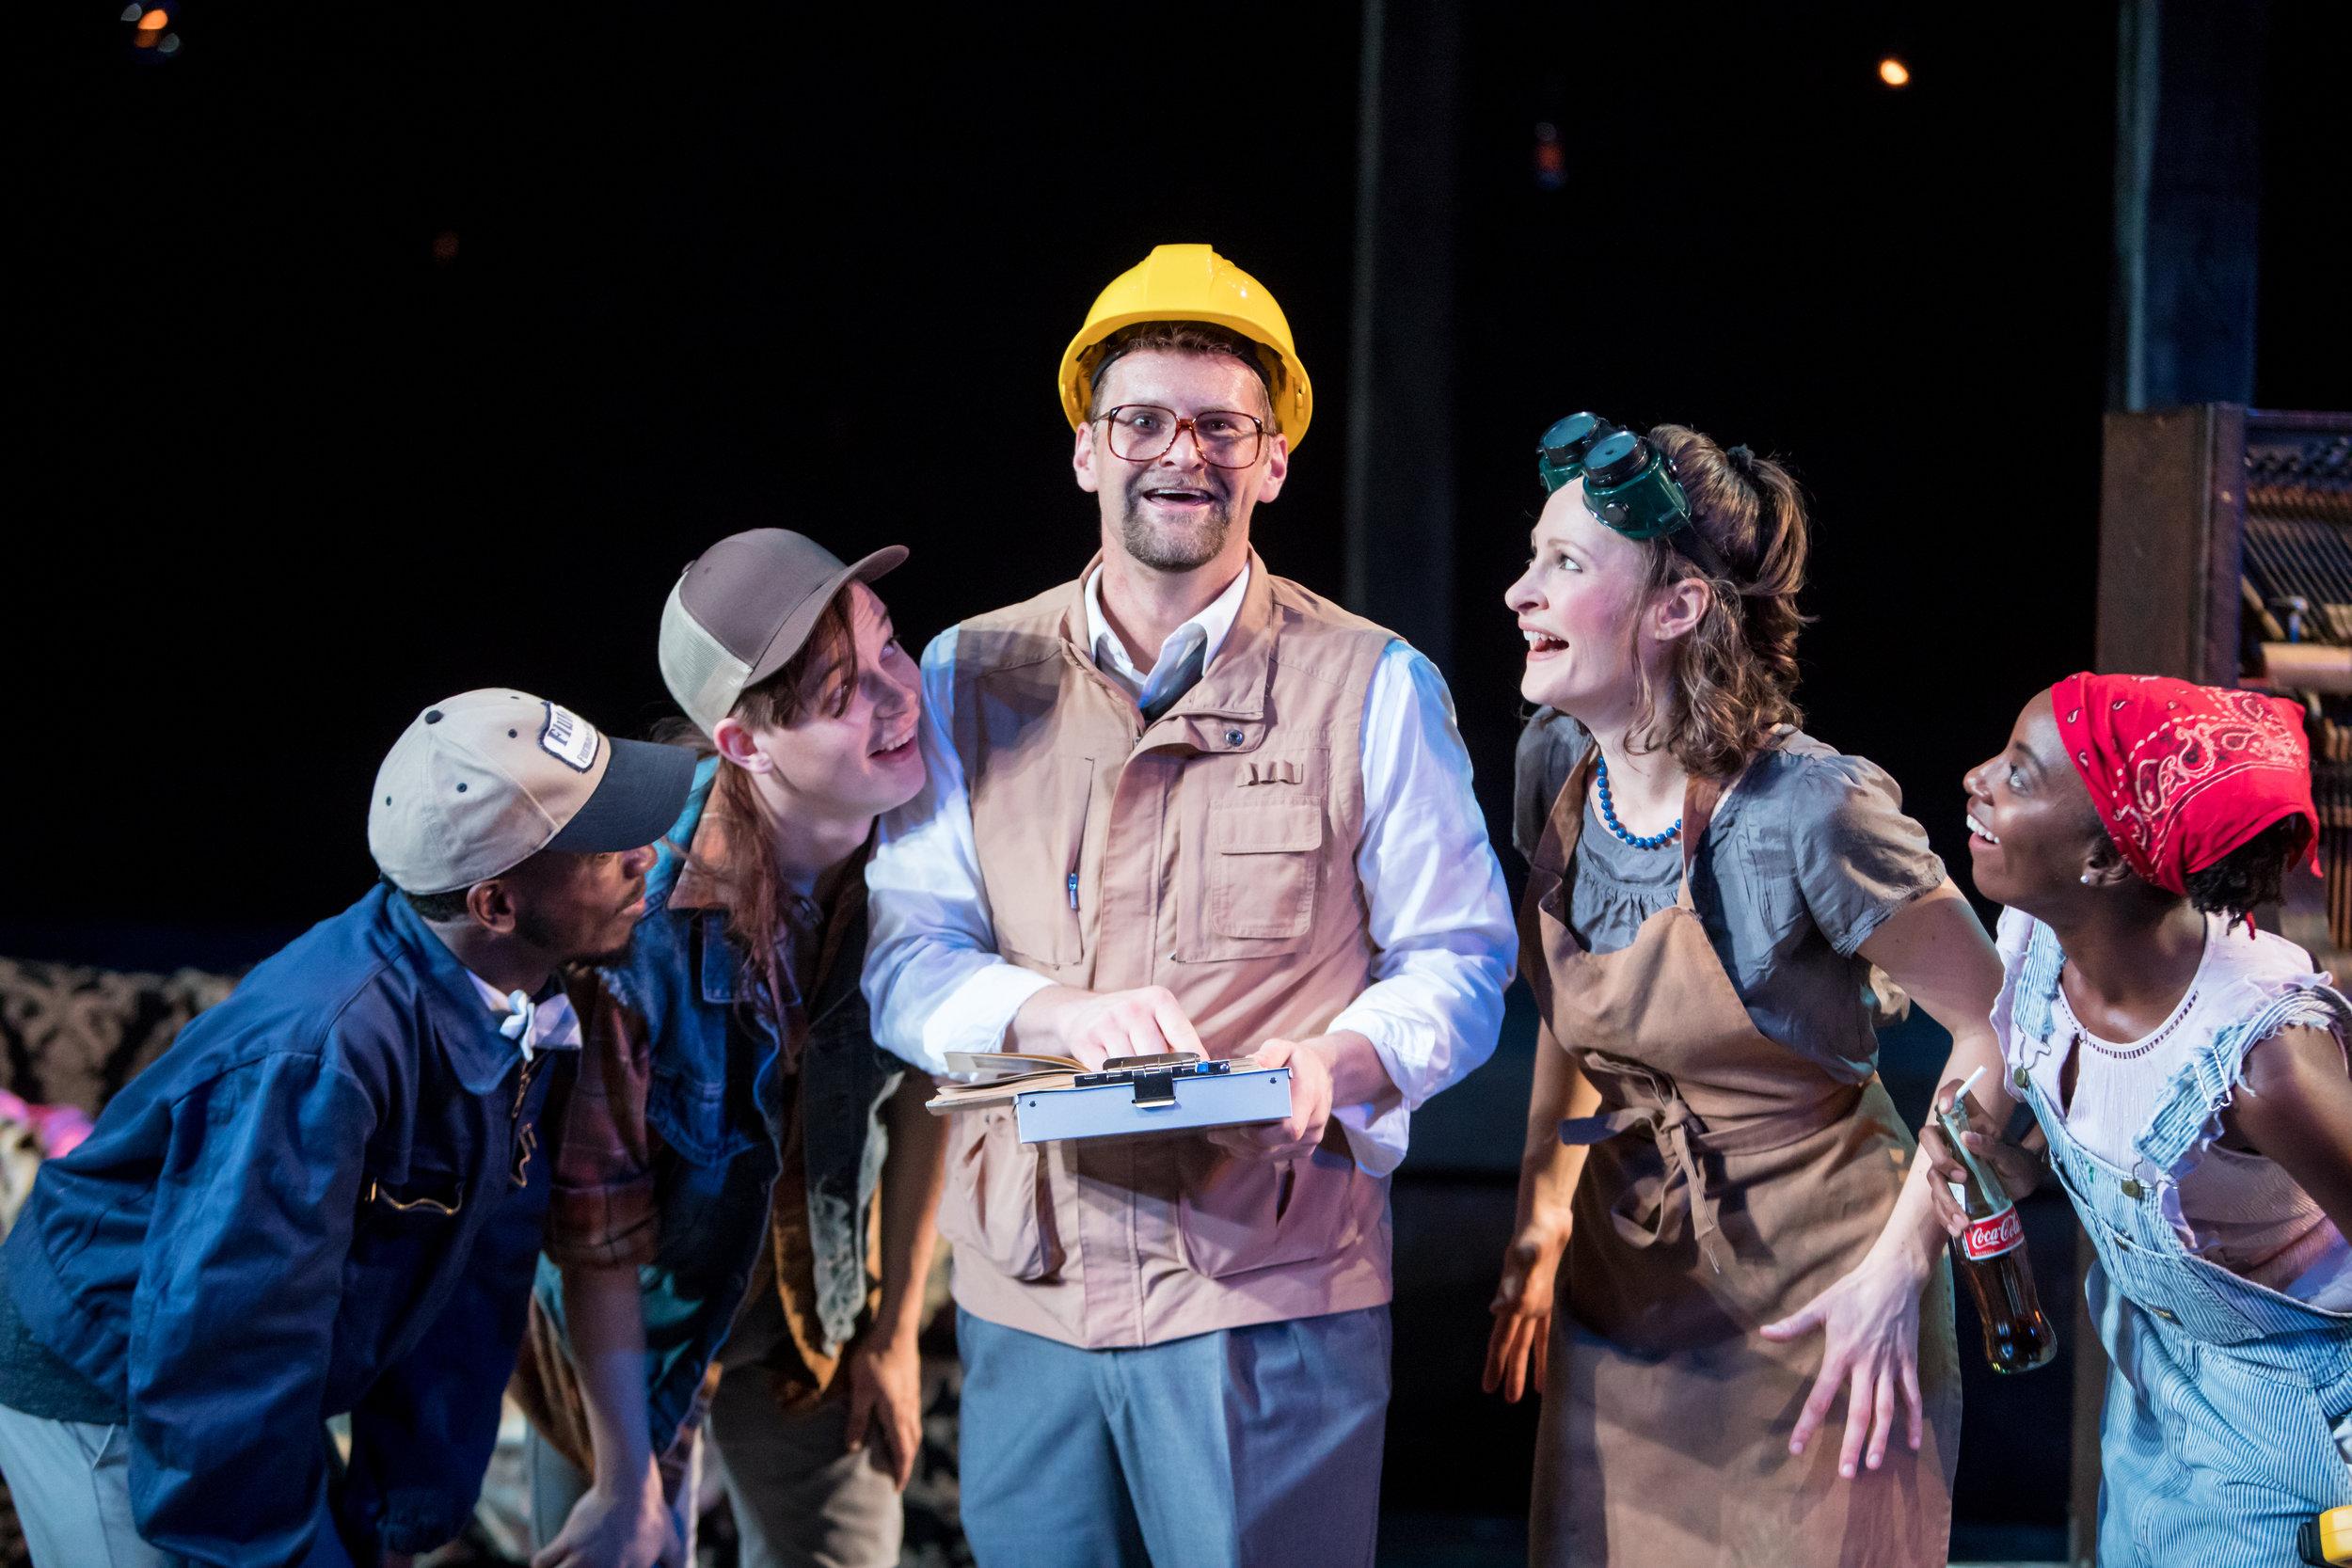 Antonio Duke (Flute), Silas Sellnow (Bottom), Andrew Carlson (Quince), Leah Gabriel (Snout) & Anique Clements (Snug)